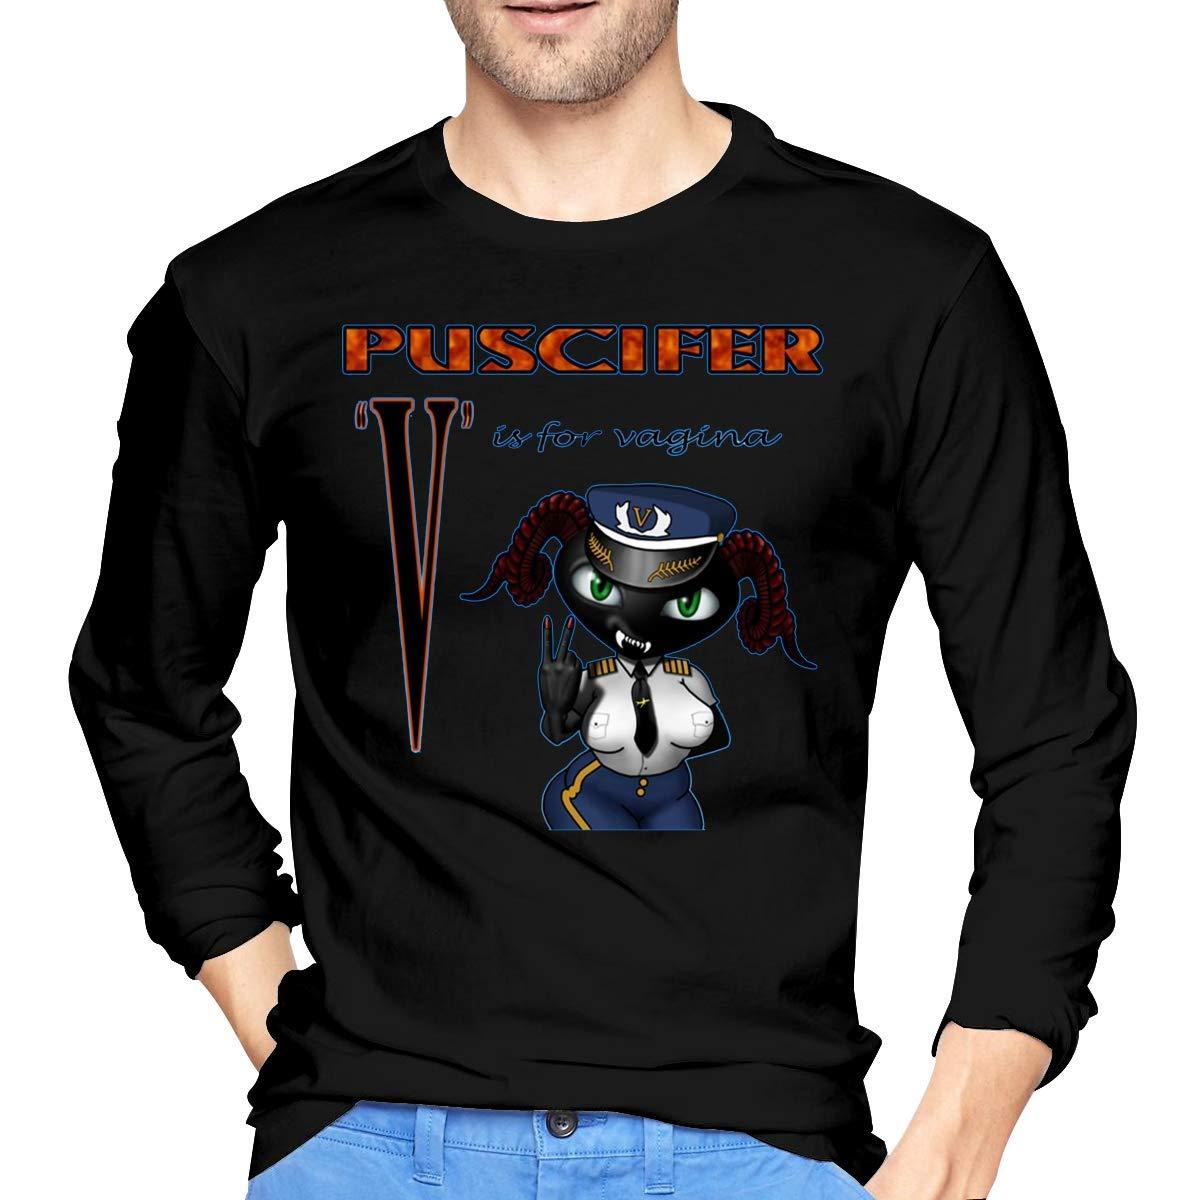 Fssatung S Puscifer V Is For Vagina T Shirts Black